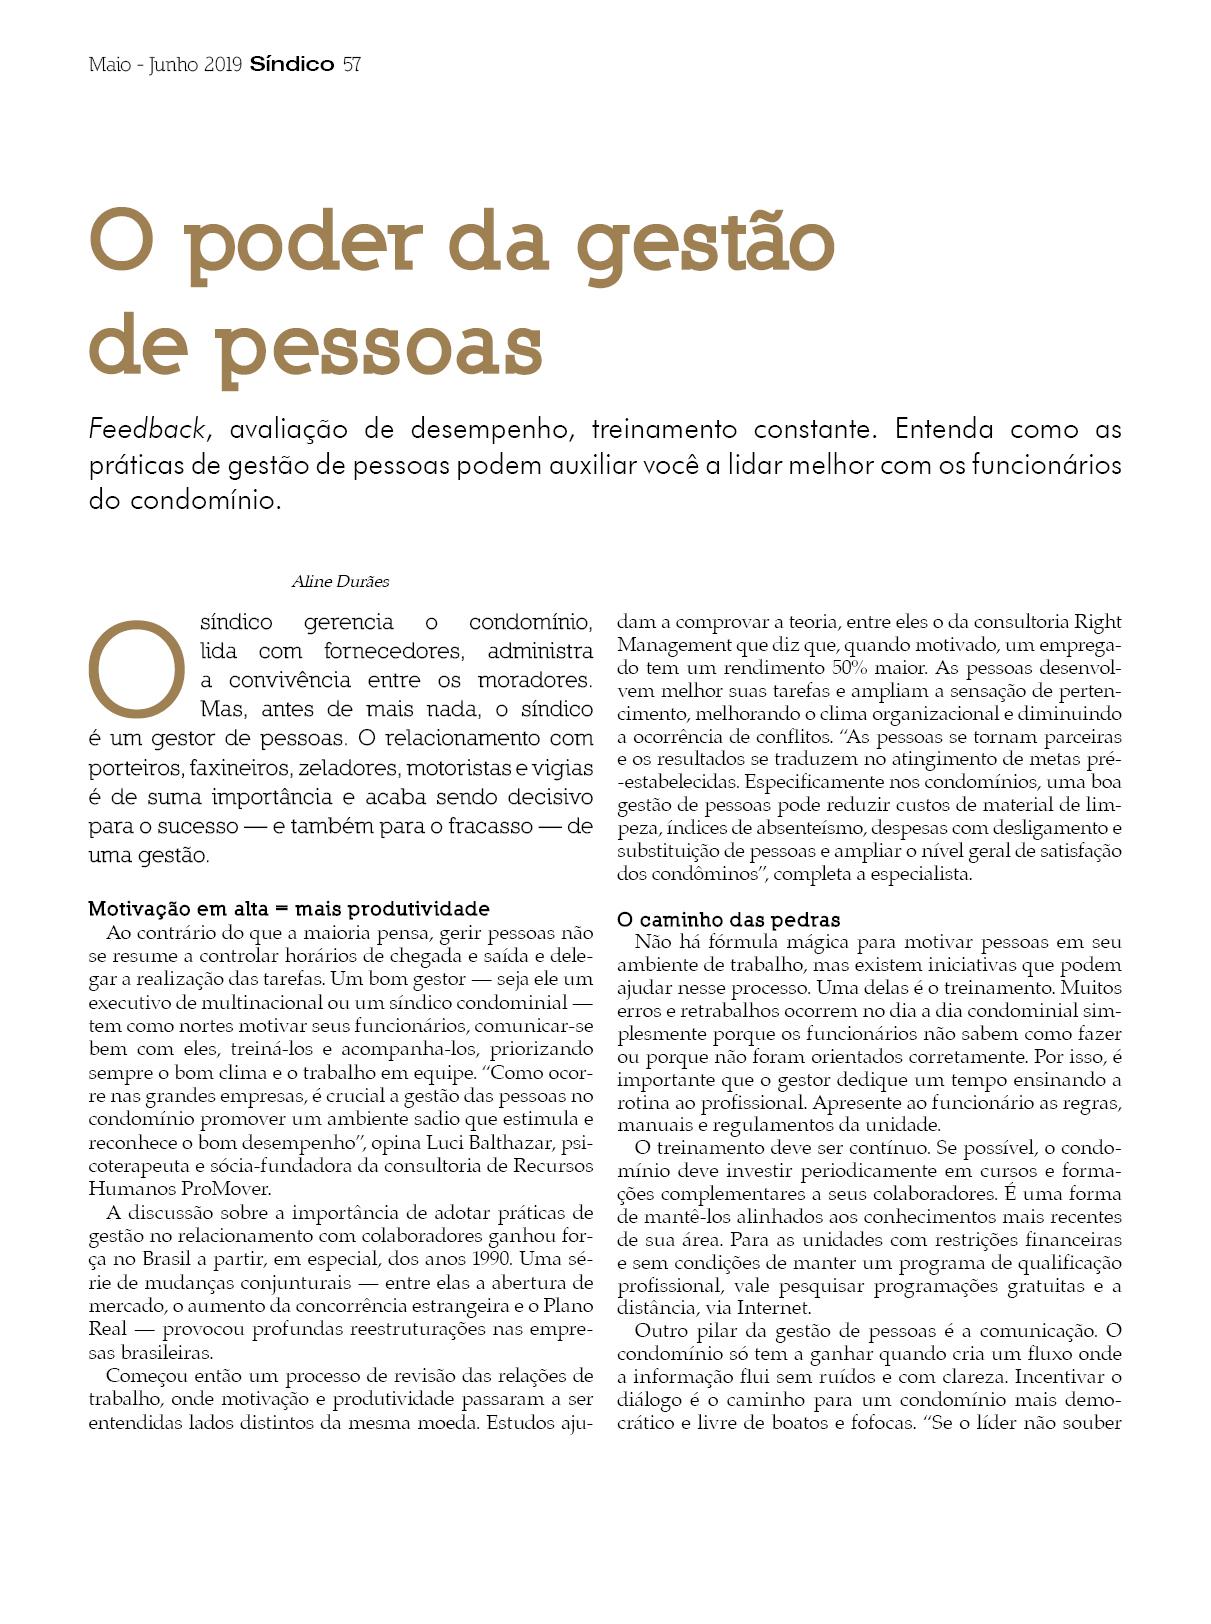 Revista Síndico_ed24455